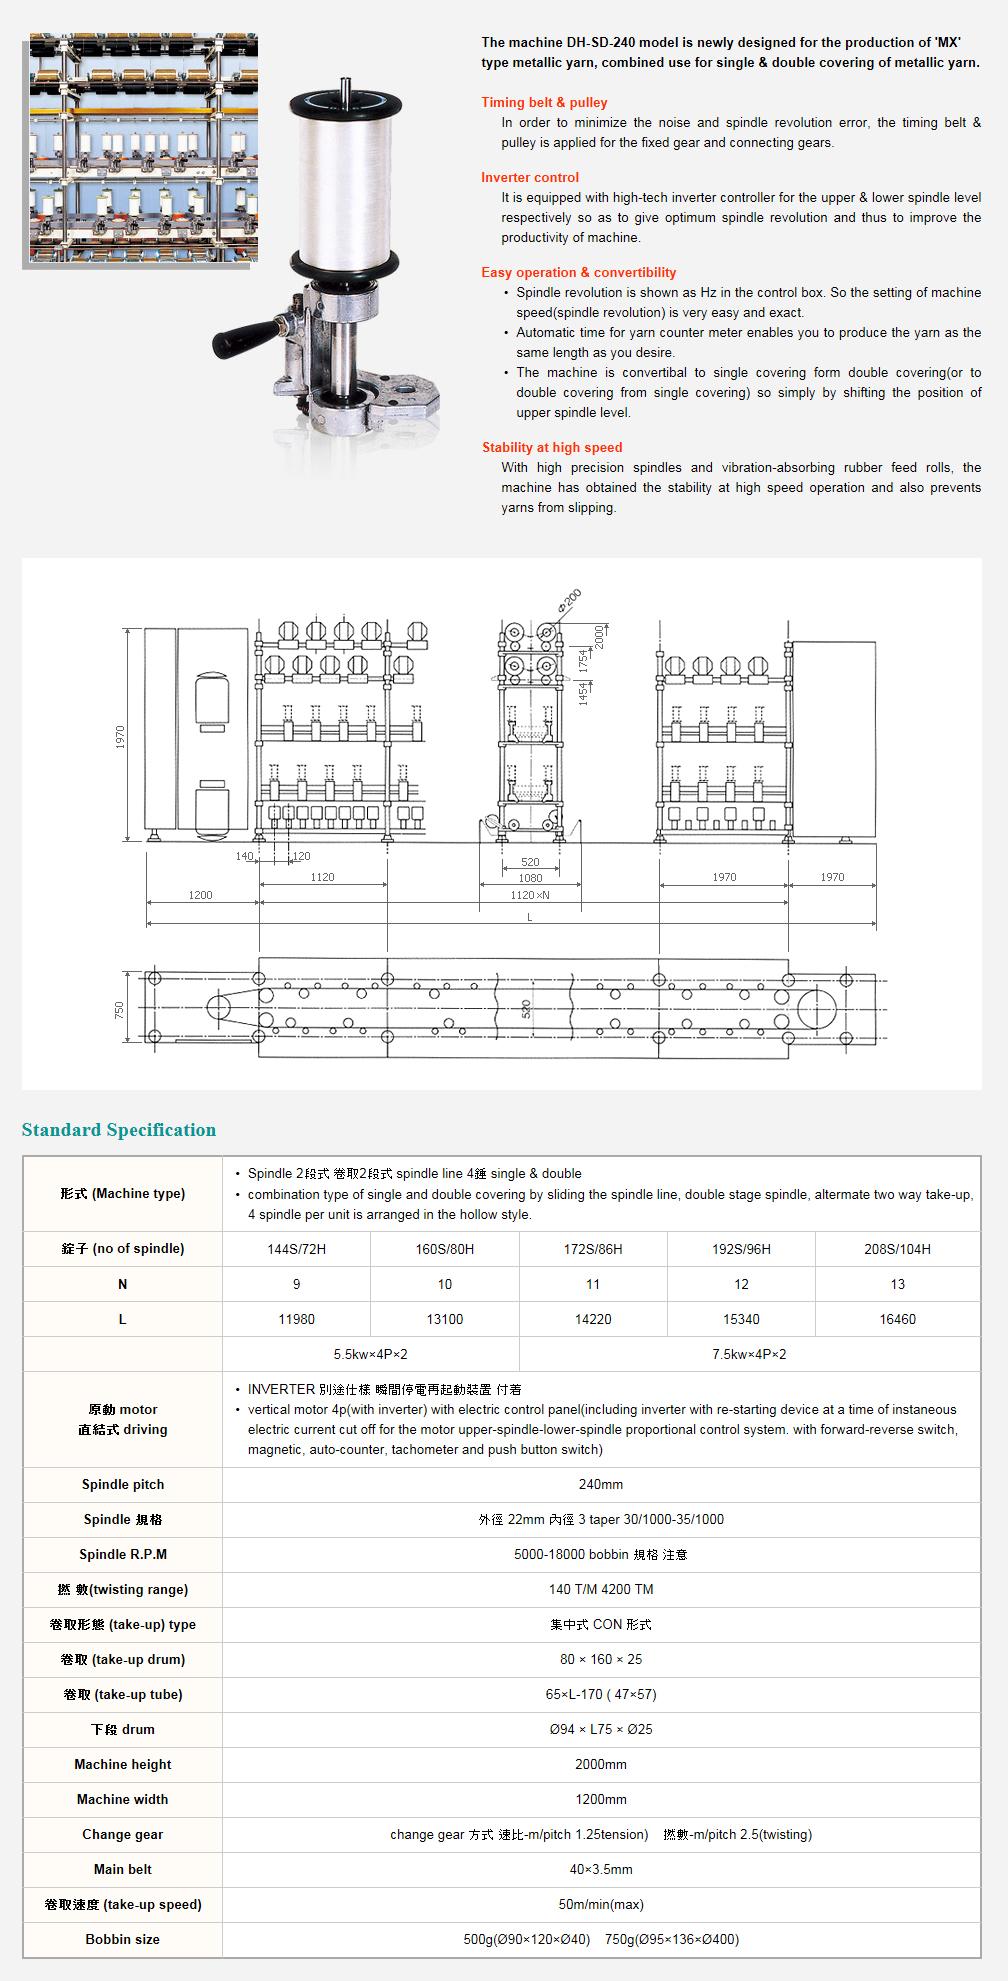 BOSUNG PRECISION MACHINE Covering Machine for Metallic Yarn DH-SD-240